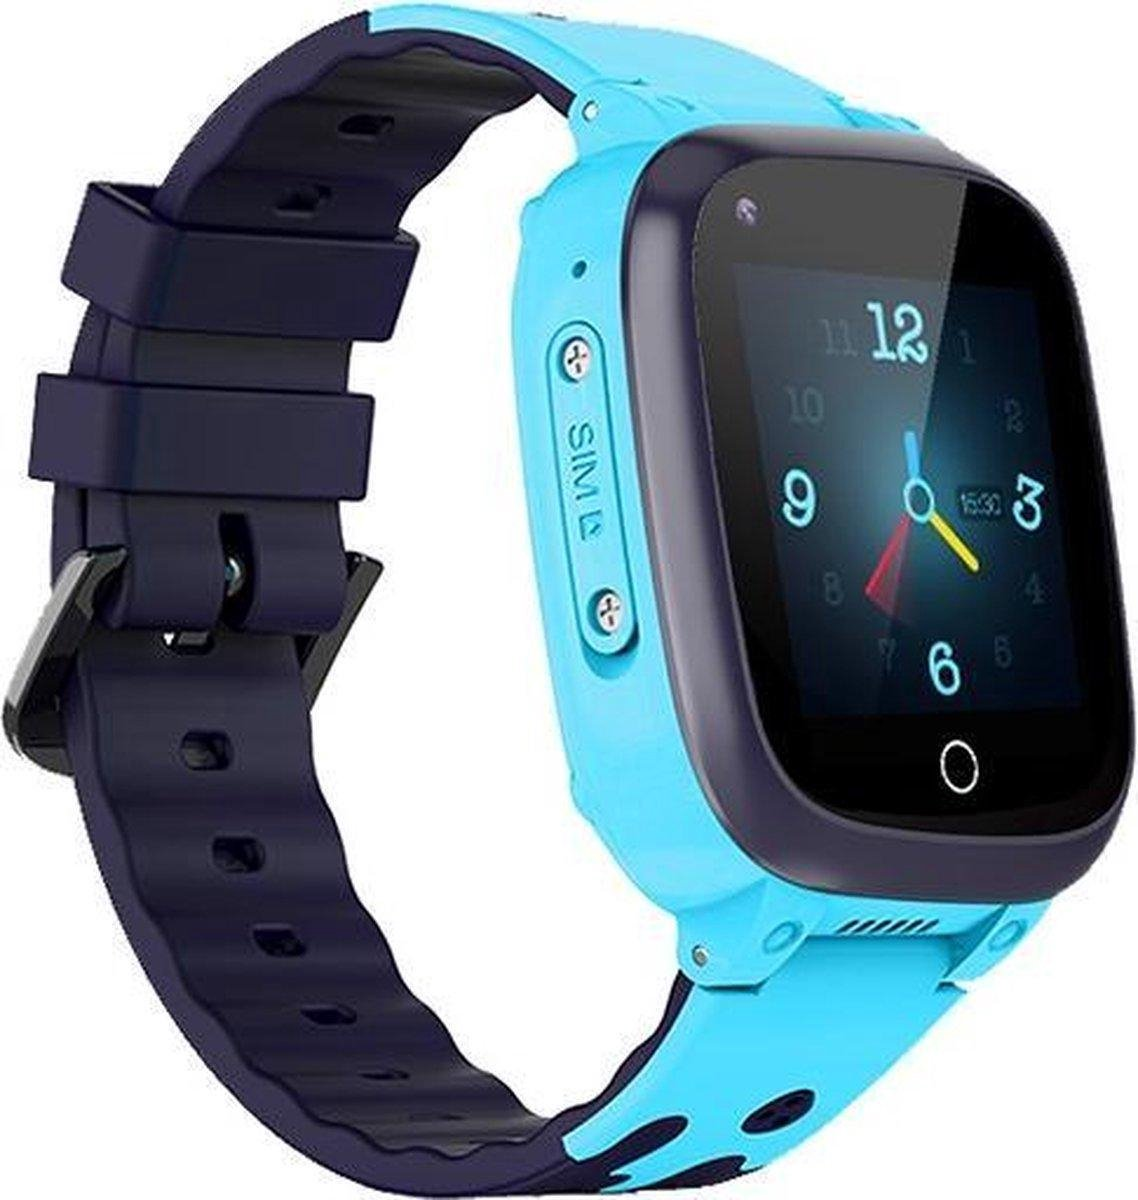 GPS Horloge Kind 4G Upgrade - GPS Tracker Kind - Blauw - GPS Horloge kinderen